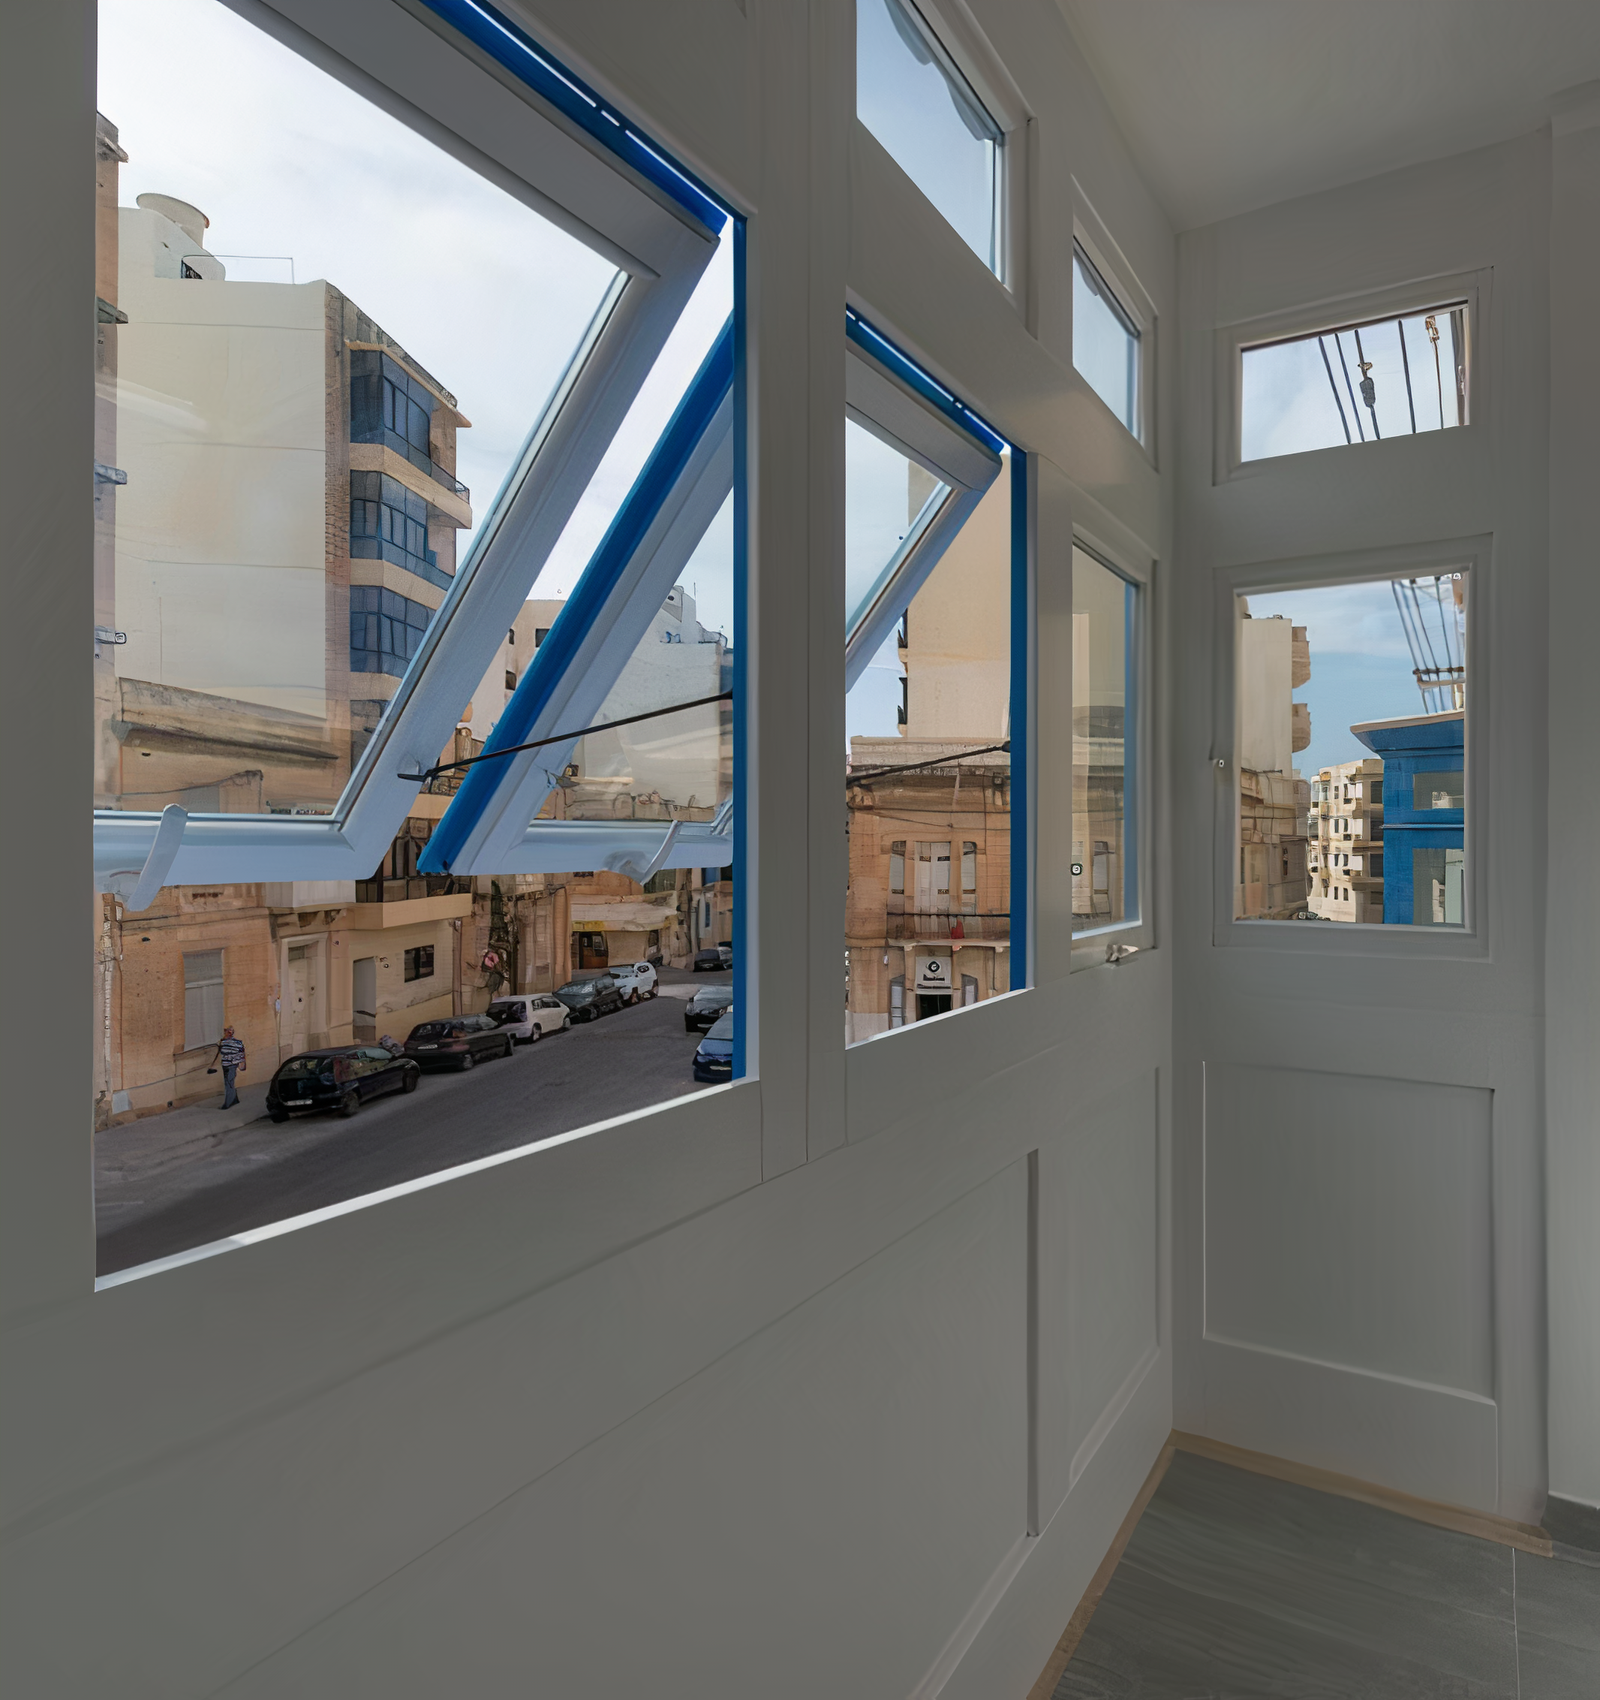 PVC, Malta balcony with open windows